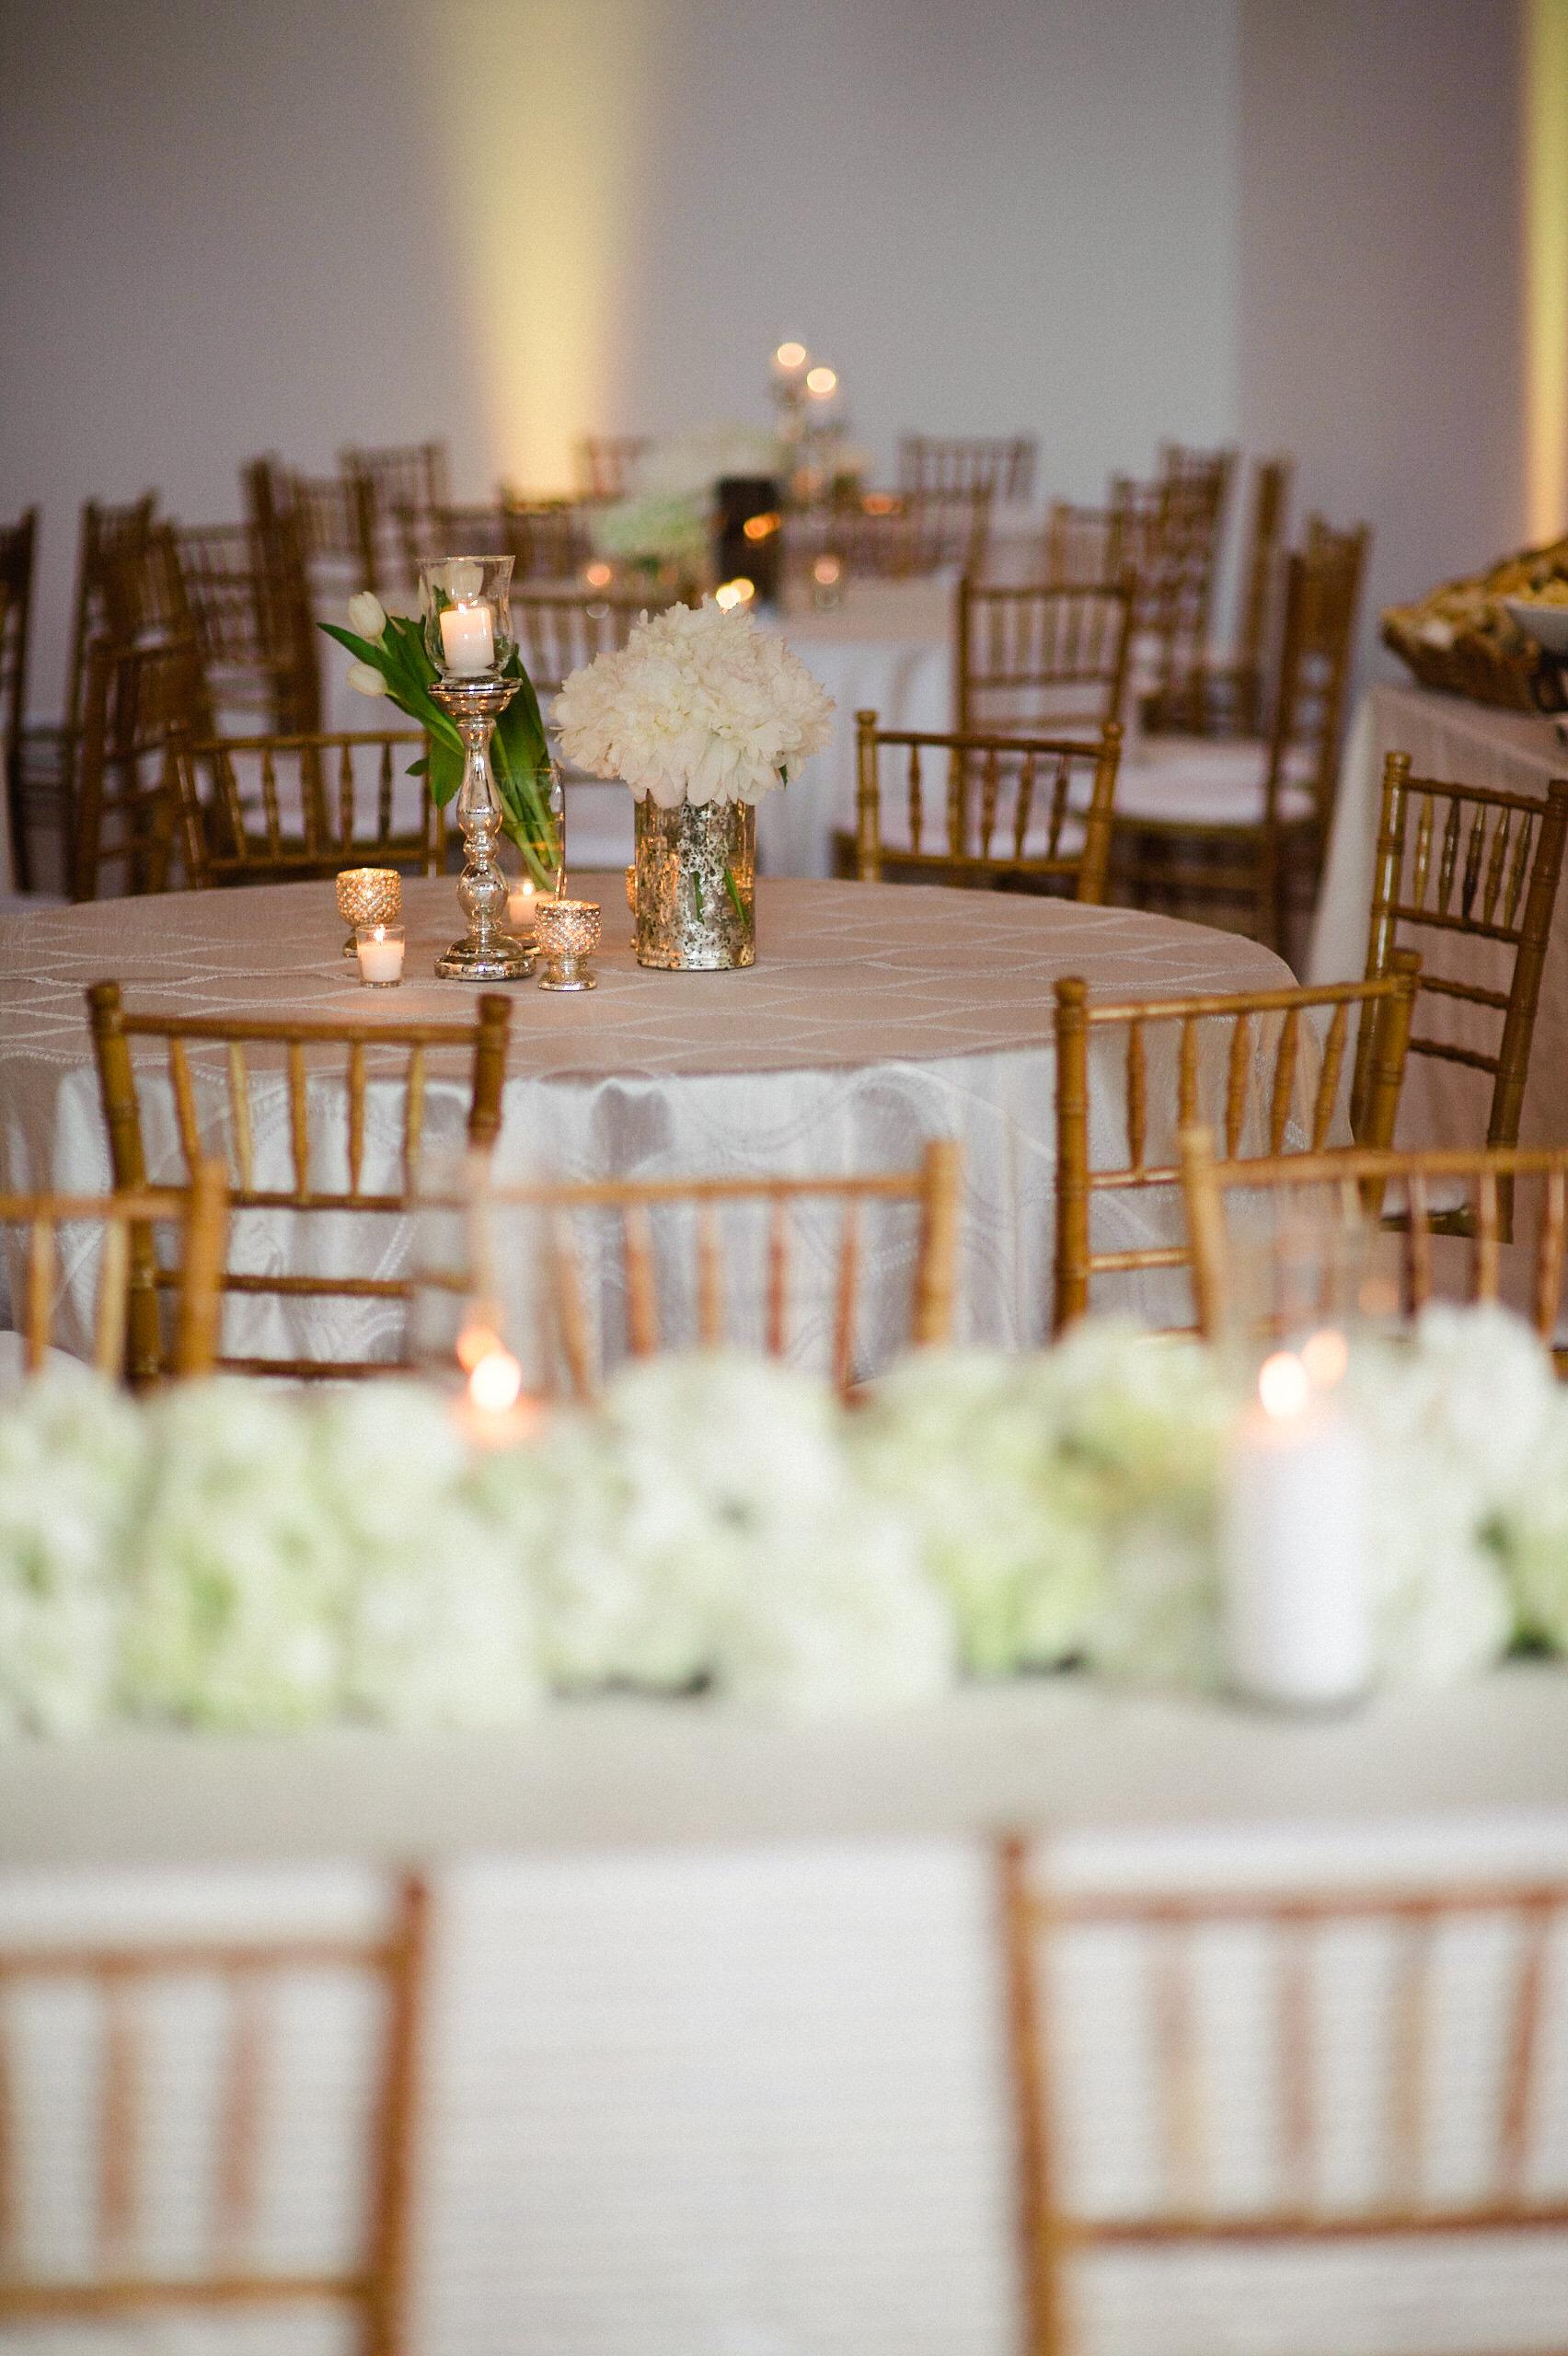 shelby&jordan|smitten&hooked|wedding|roomreveal-001.jpg